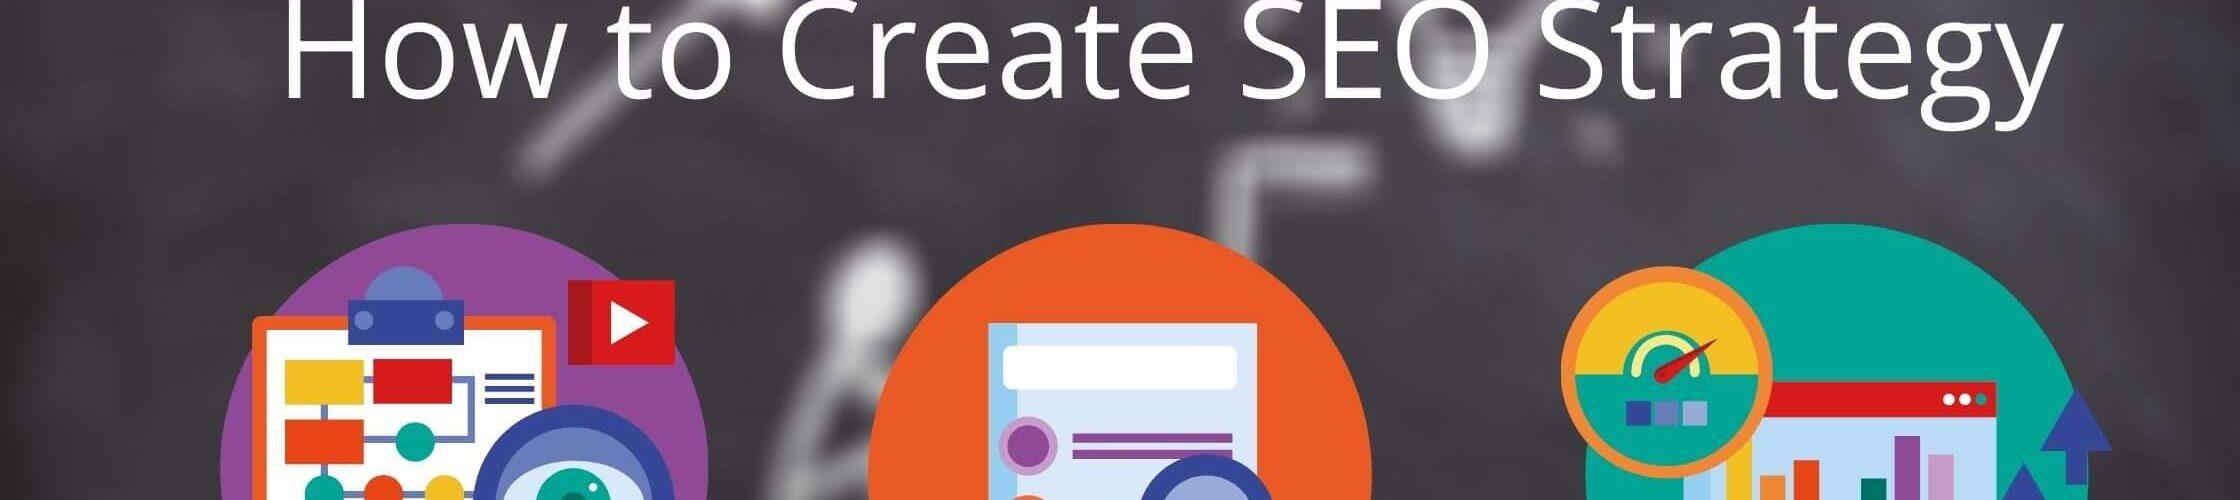 How to Create an SEO Strategy